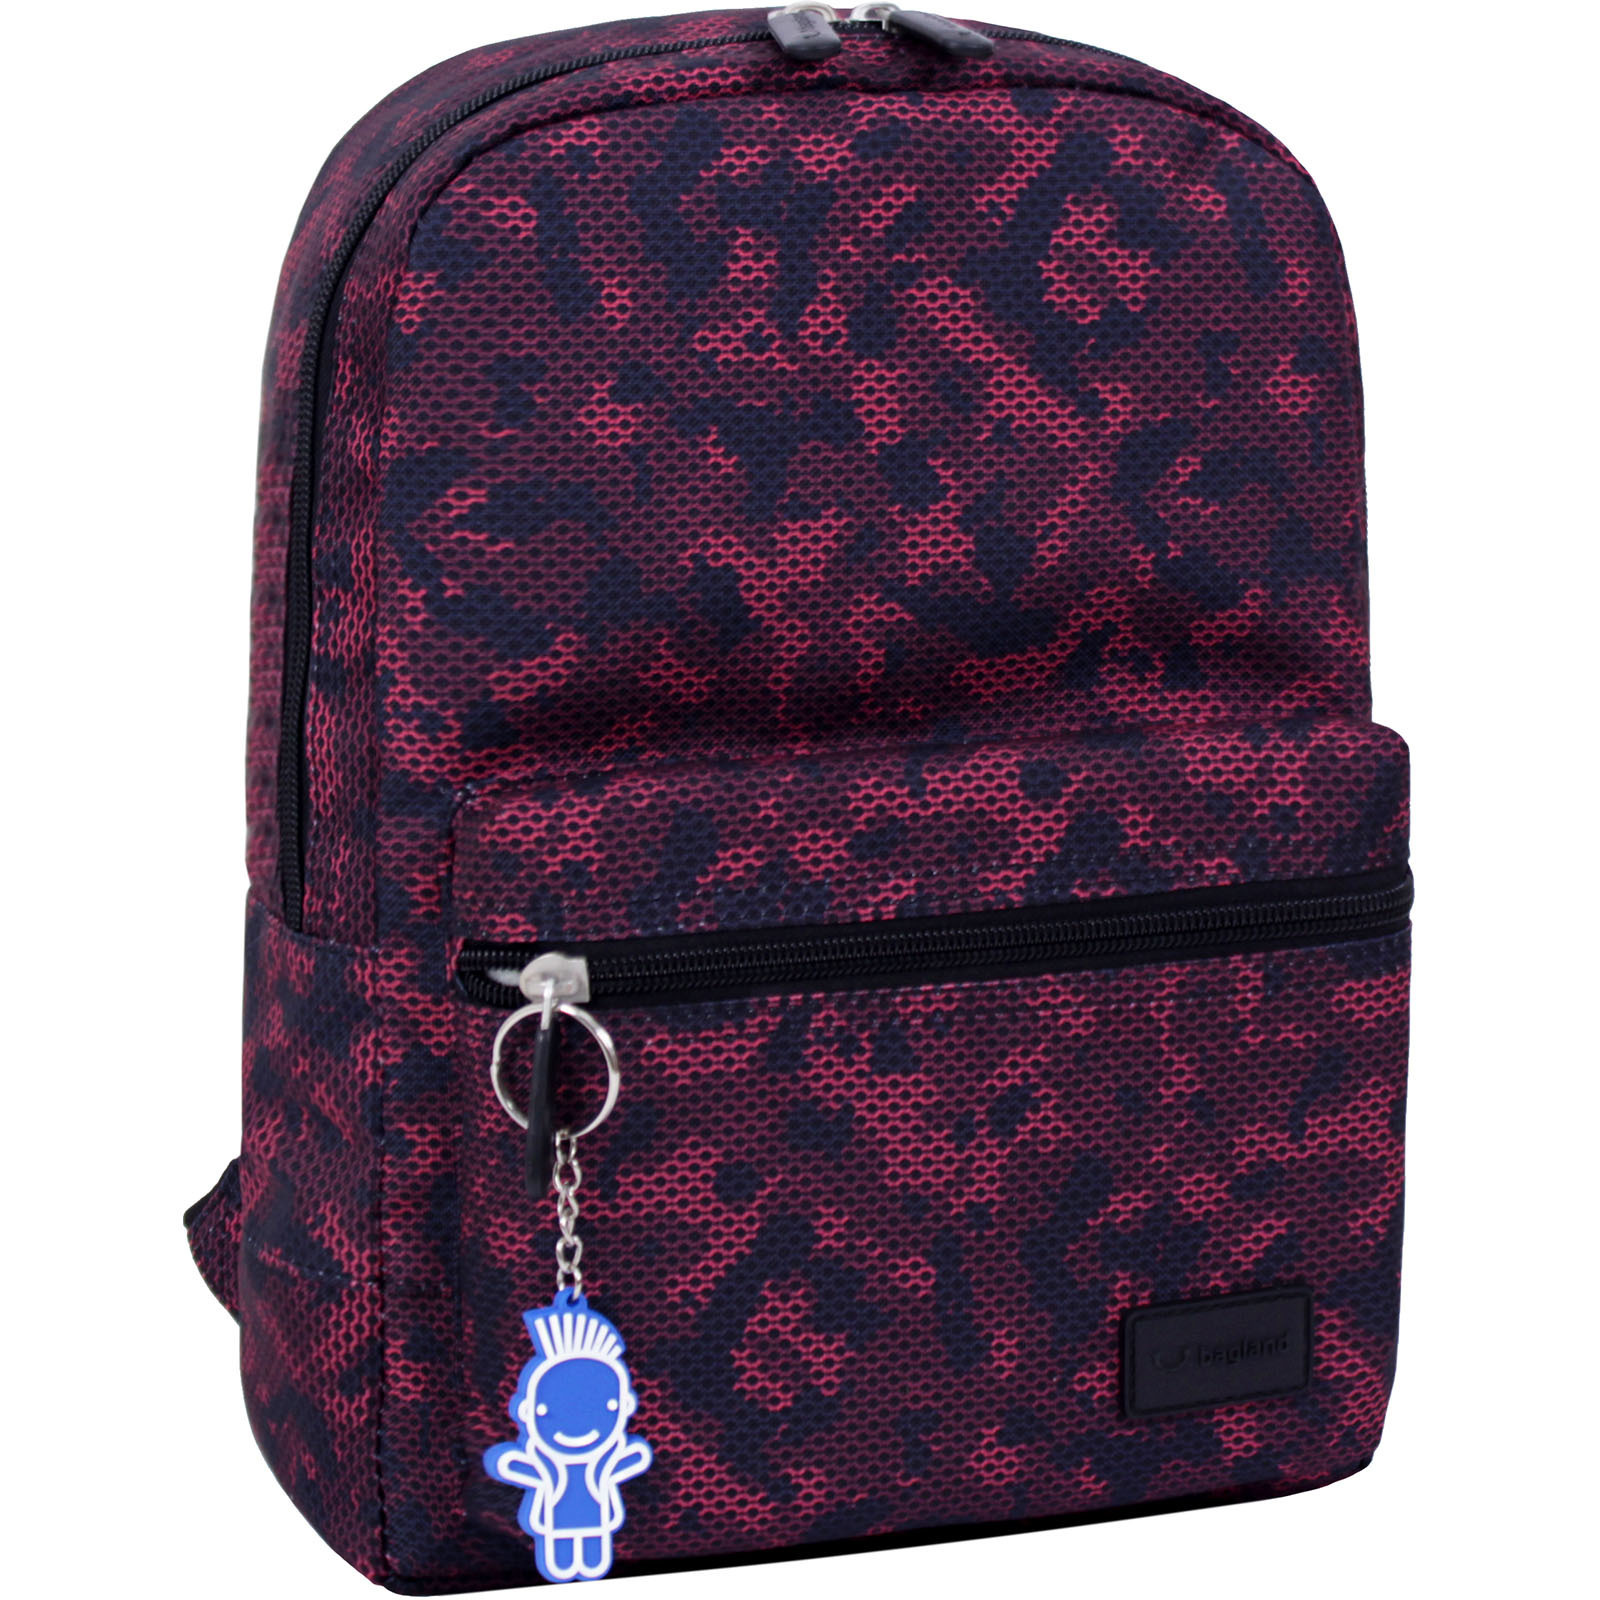 Молодежные рюкзаки Рюкзак Bagland Молодежный mini 8 л. сублимация (466) (00508664) IMG_3711_суб.466_.JPG